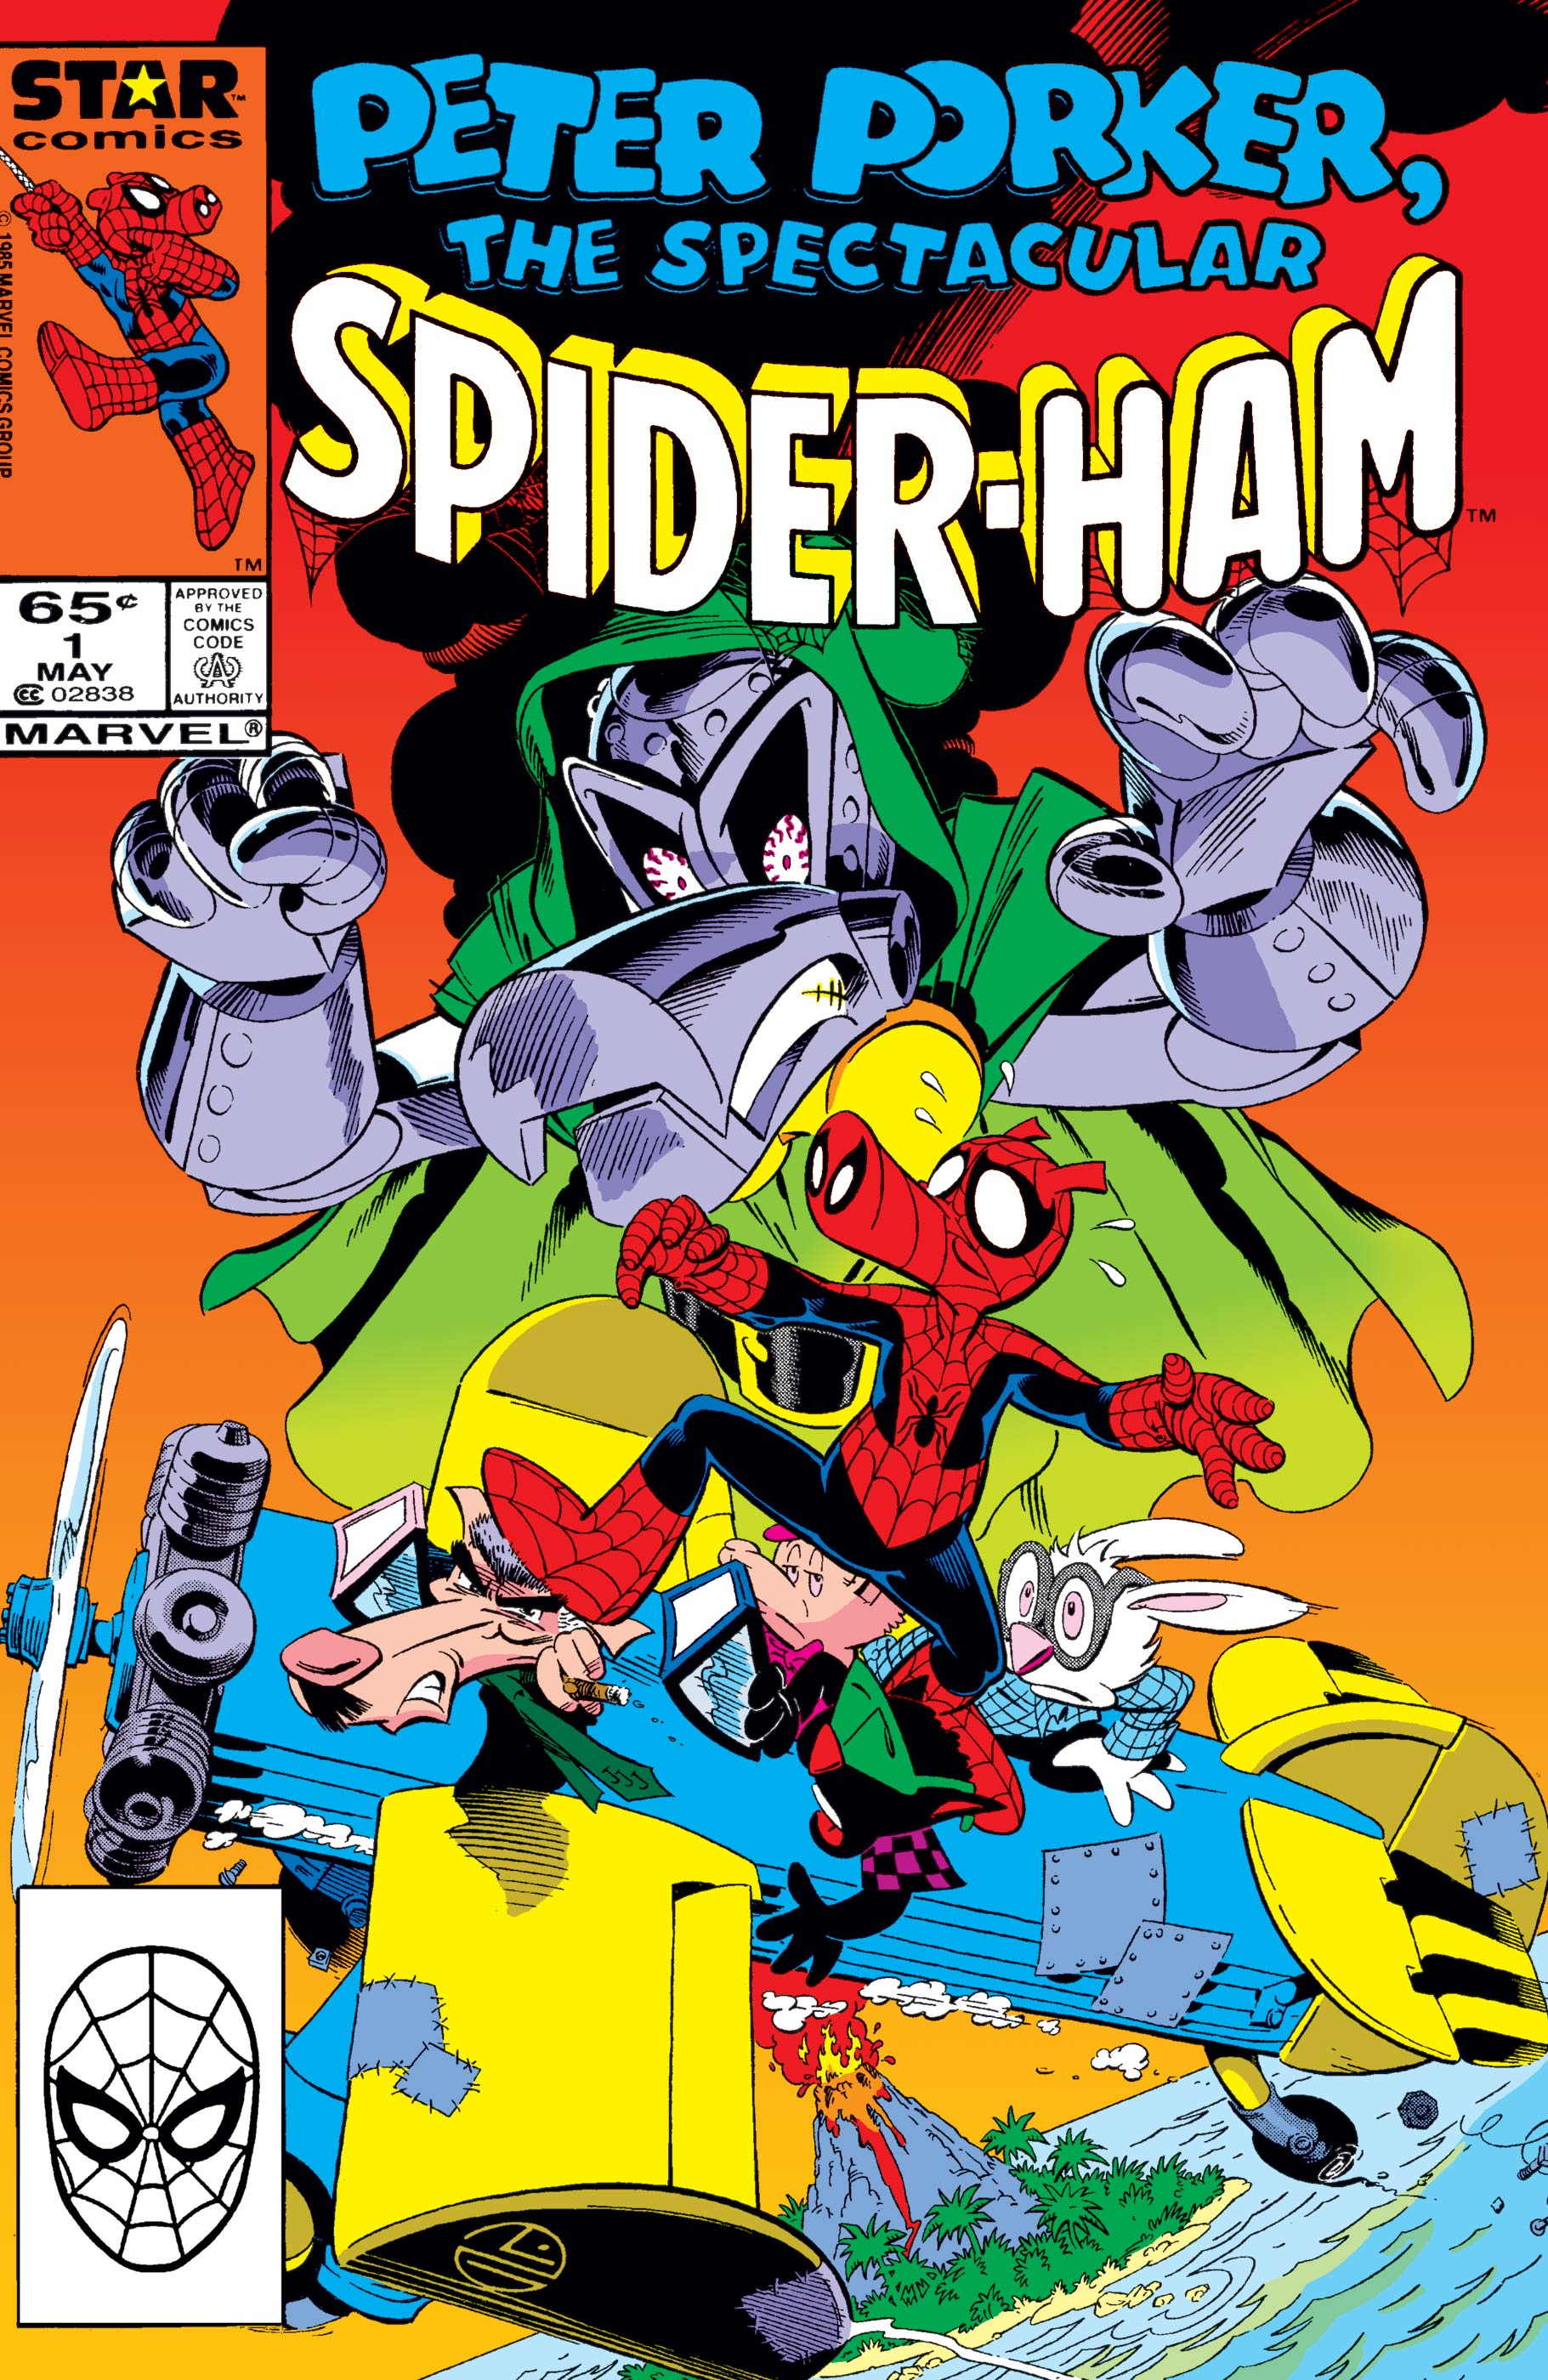 Peter Porker, the Spectacular Spider-Ham (1985) #1